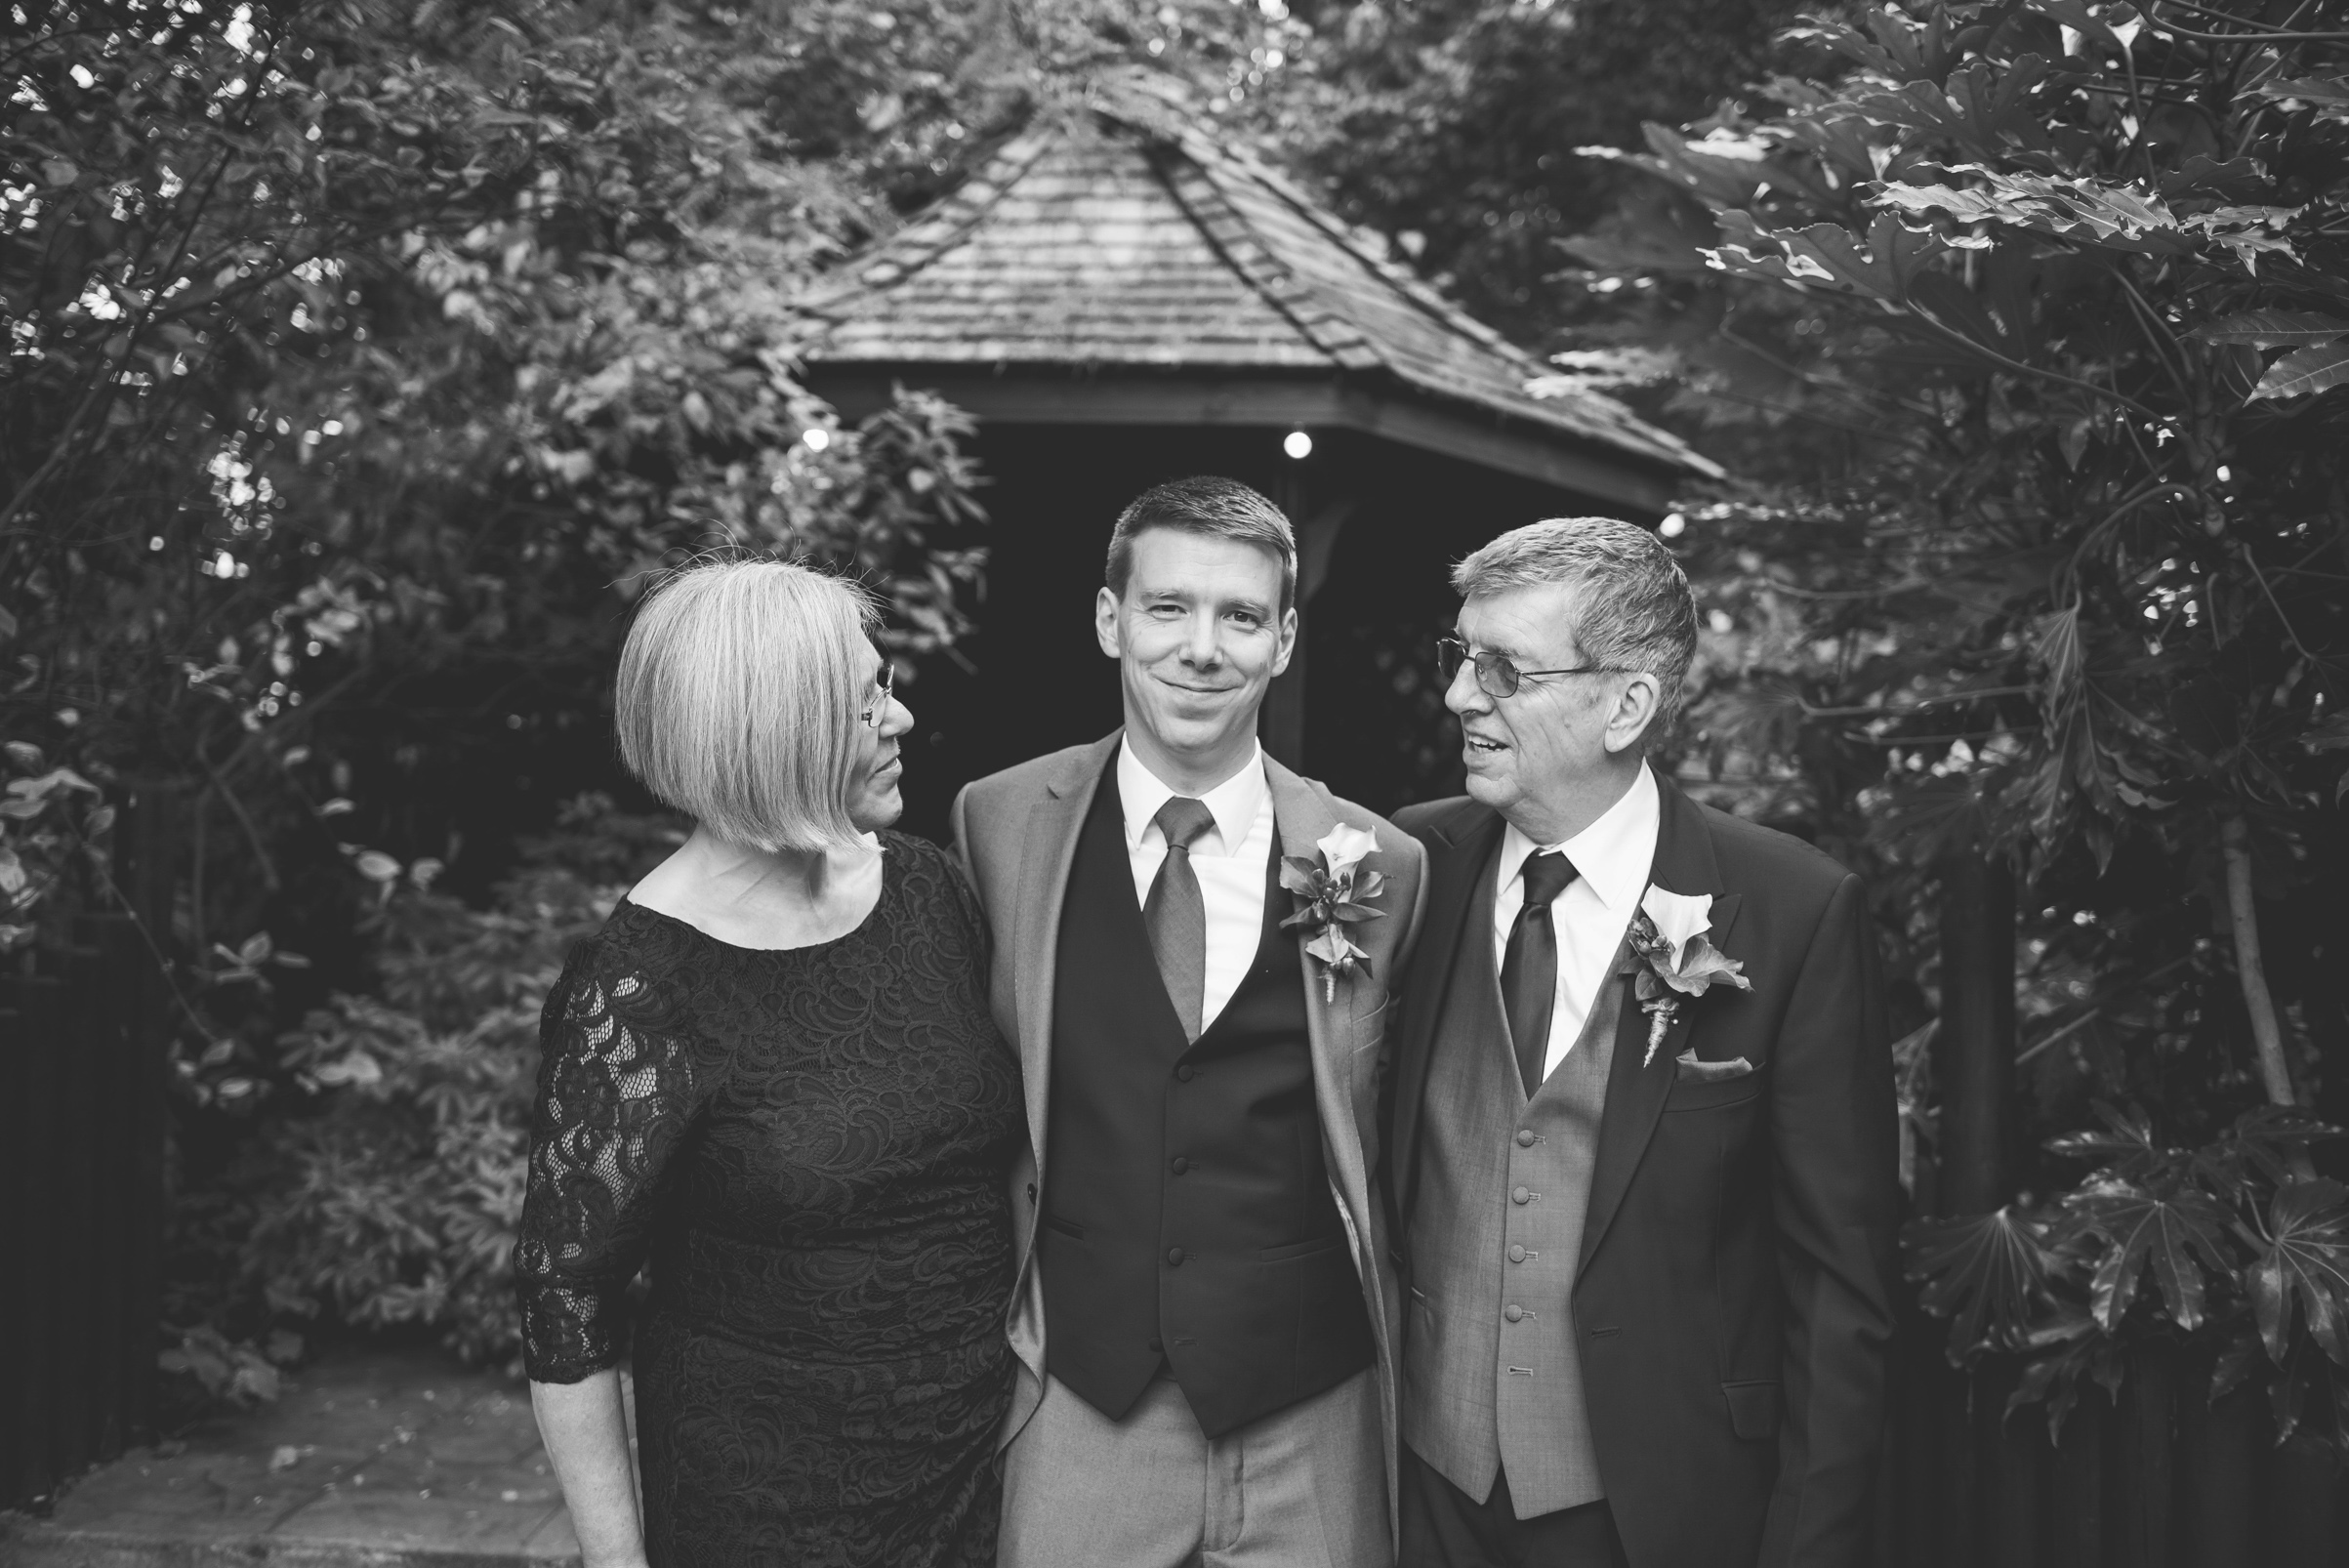 The+Fairlawns+wedding+Aldridge+StLukes+Church-151.jpg